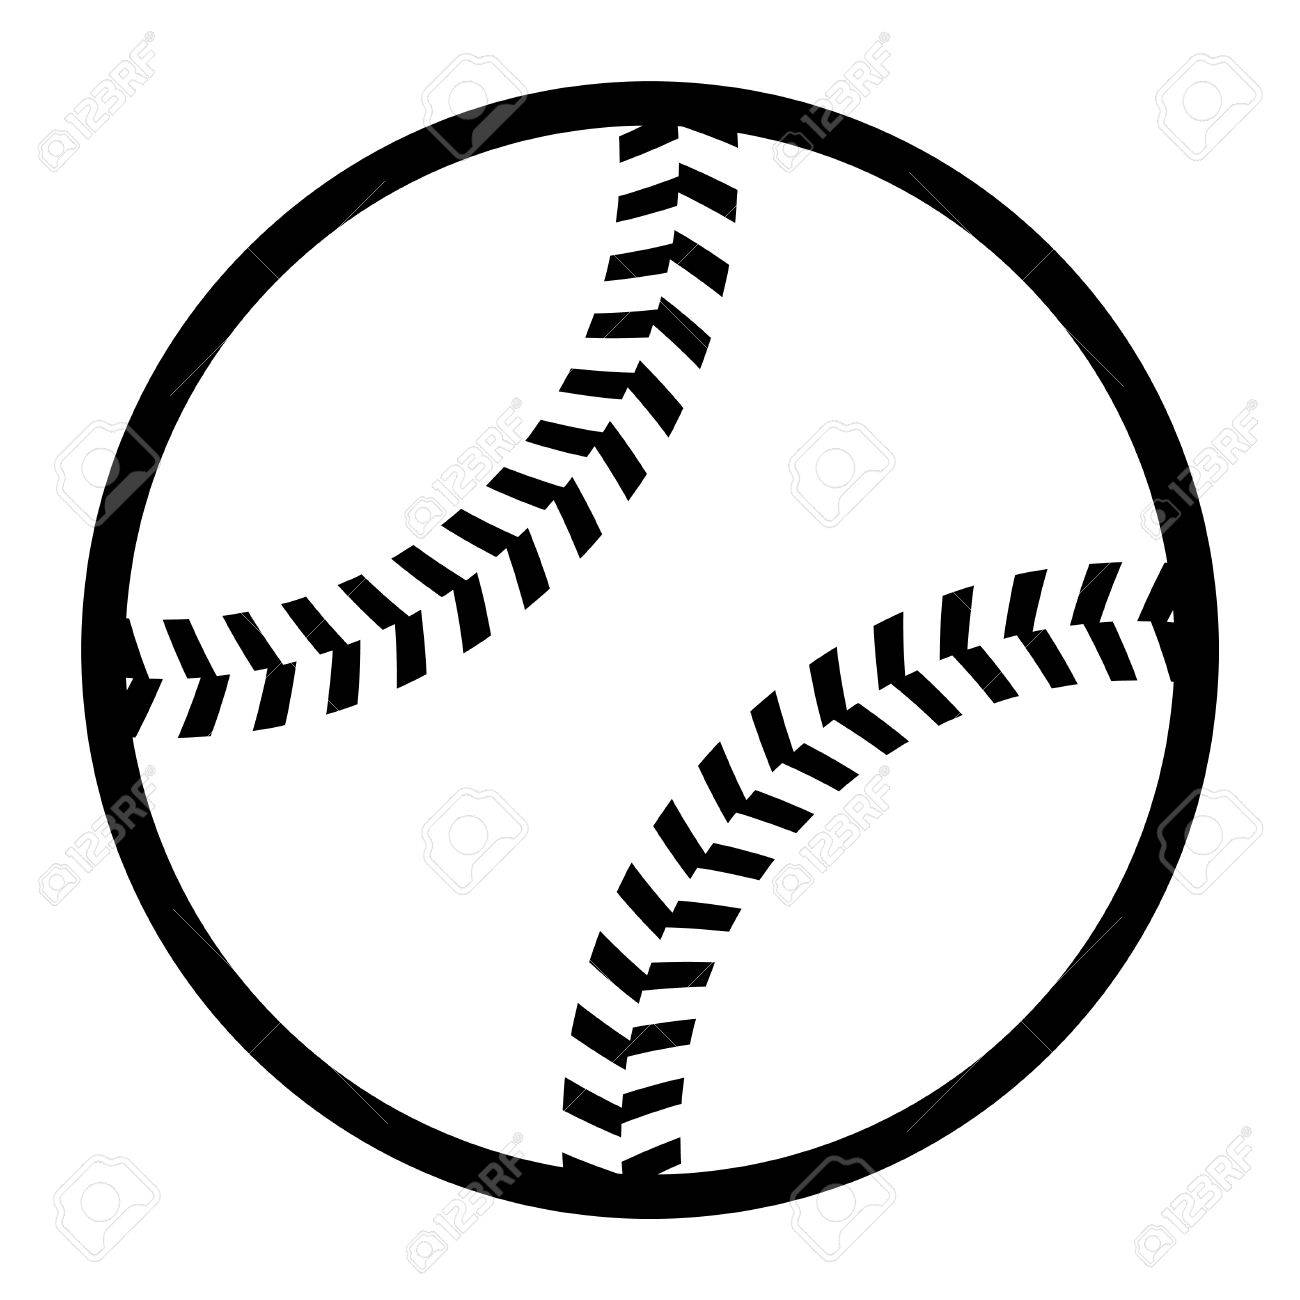 baseball vector icon royalty free cliparts vectors and stock rh 123rf com baseball vector art free baseball vector free